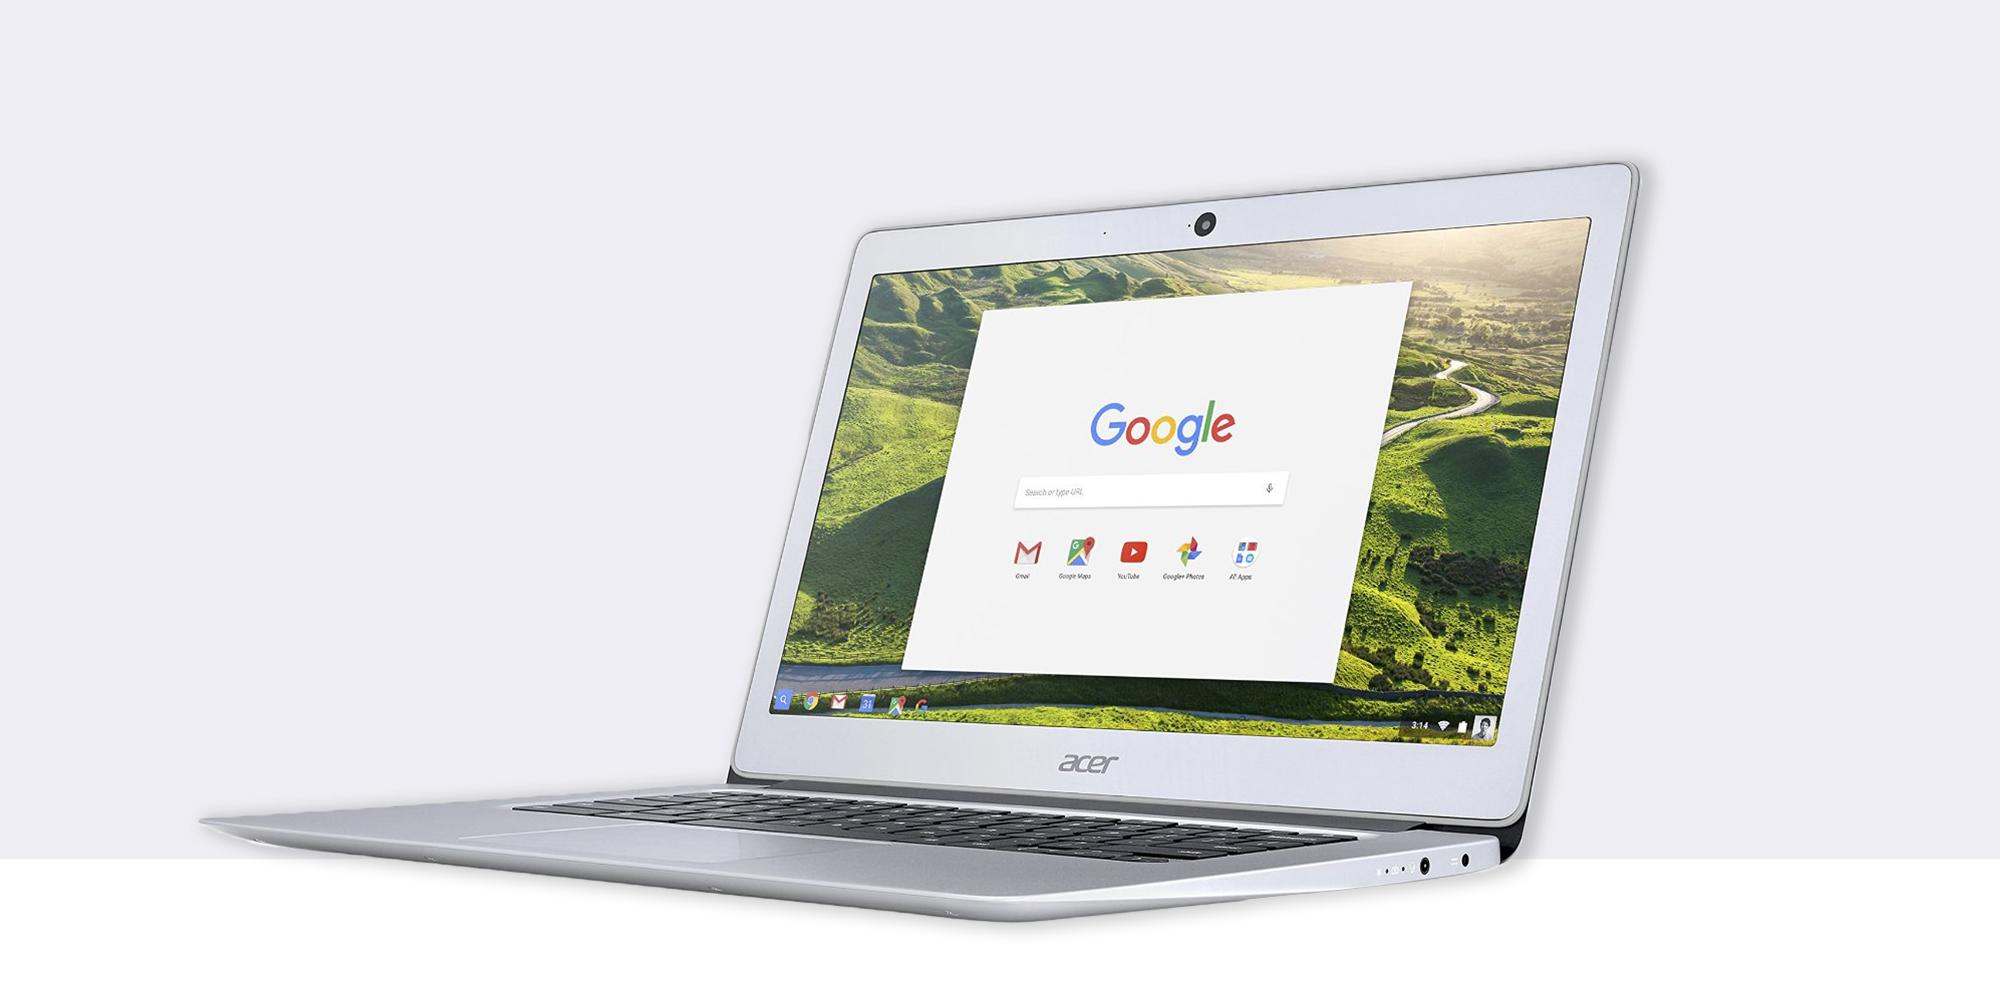 2018 S Best Cheap Laptops Under 500 Cheap Laptop Reviews